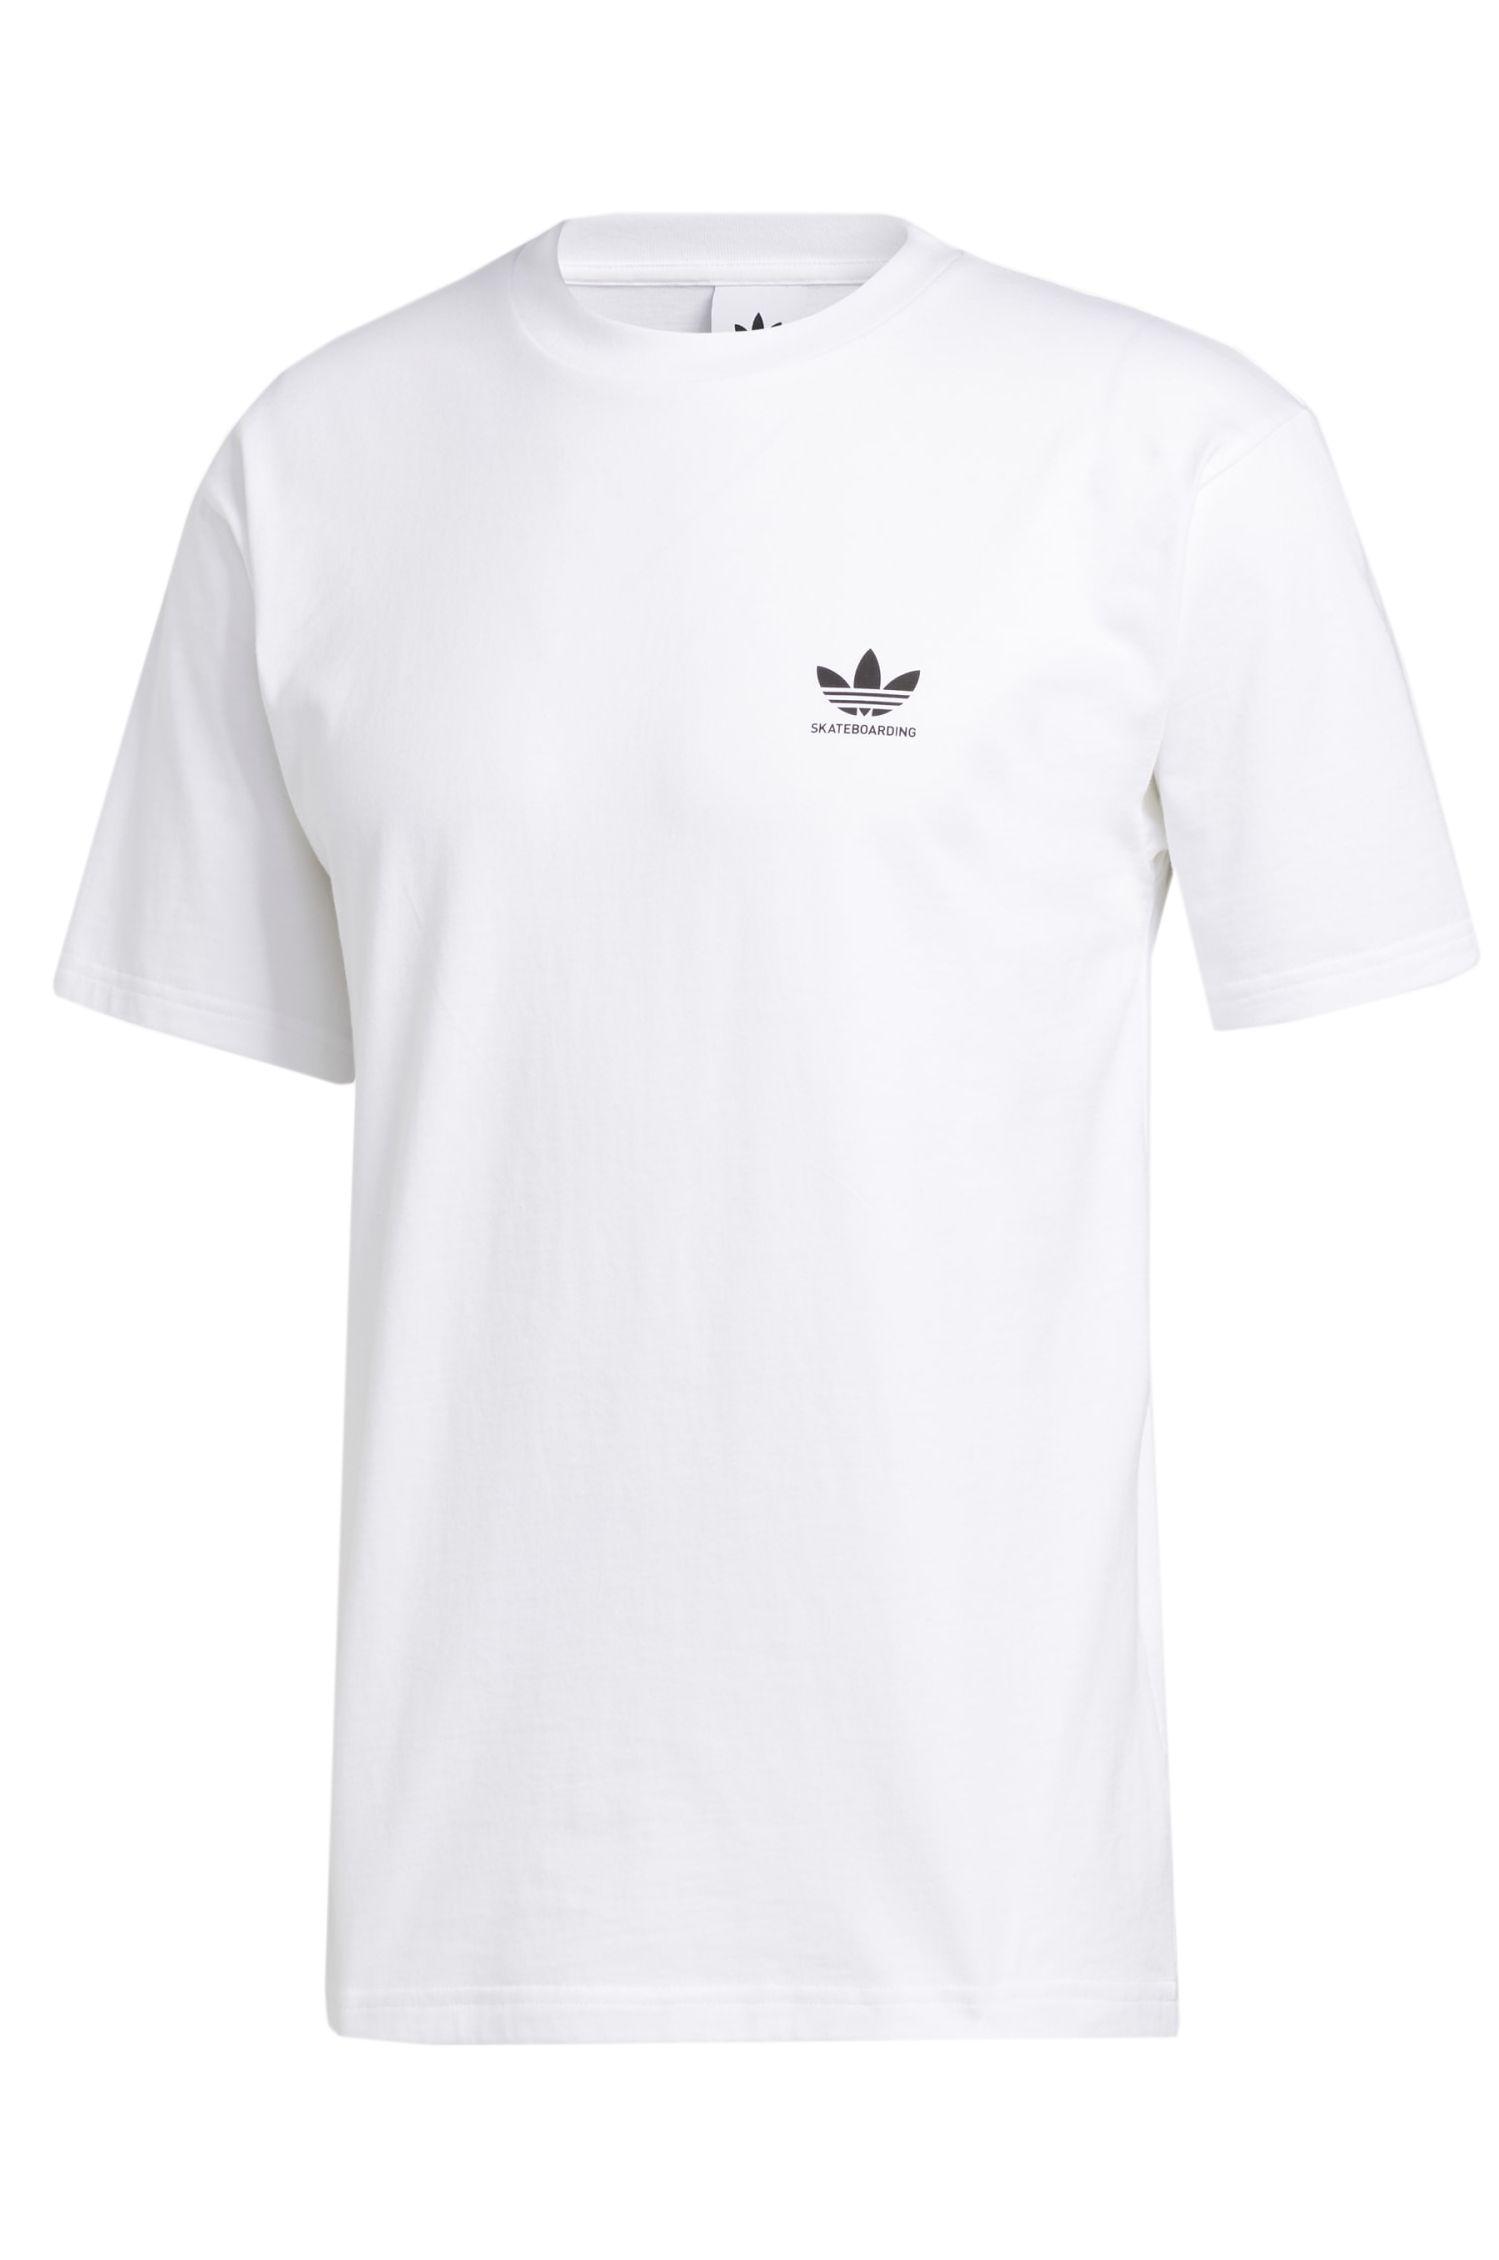 T-Shirt Adidas 2.0 LOGO SS TEE White/Black